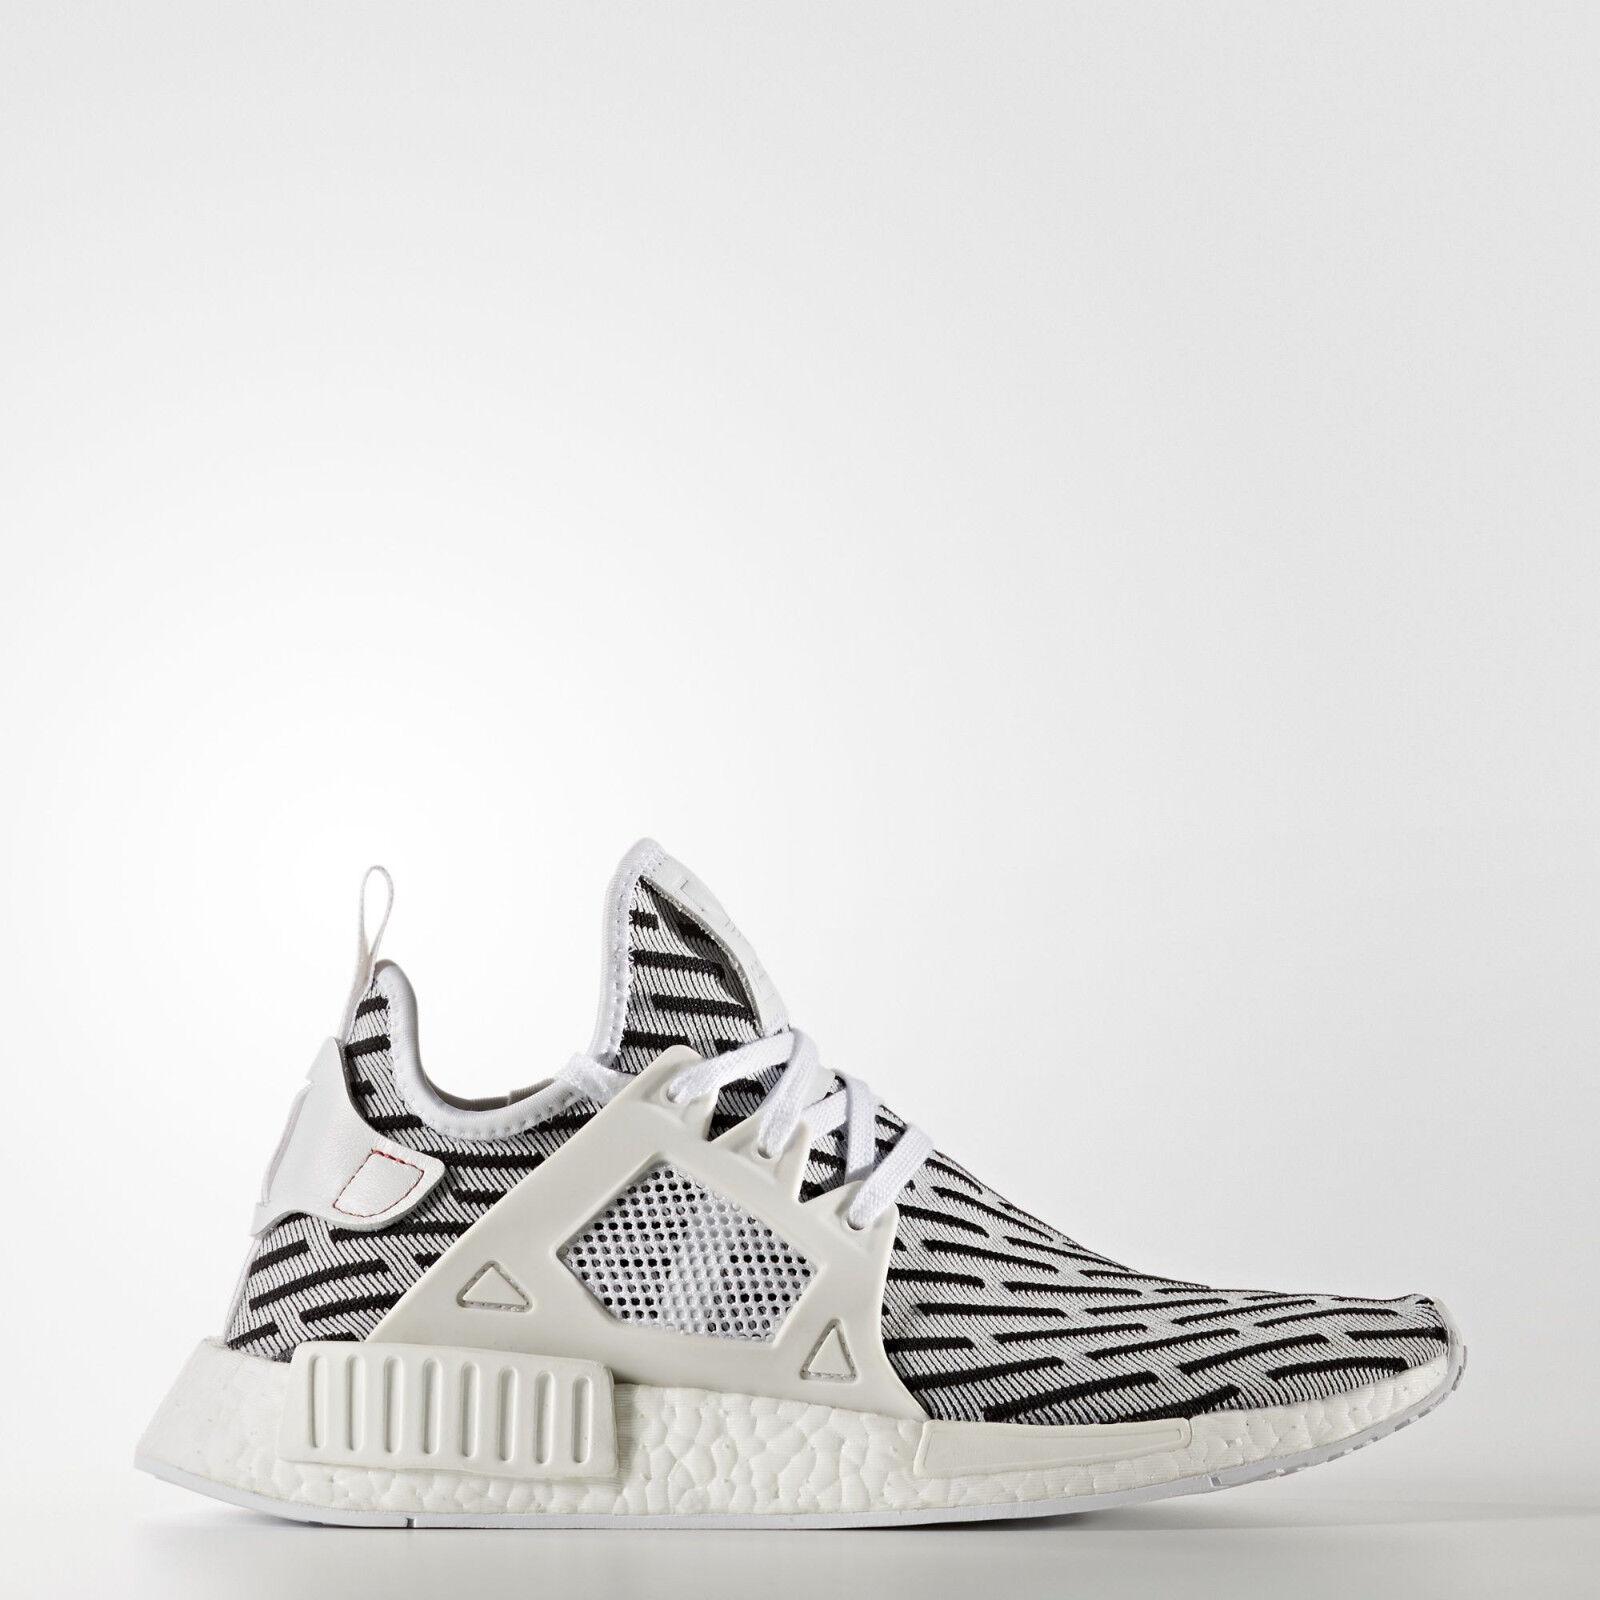 Adidas Originals NMD_XR1 PK Zebra Mens Boost DS BB2911